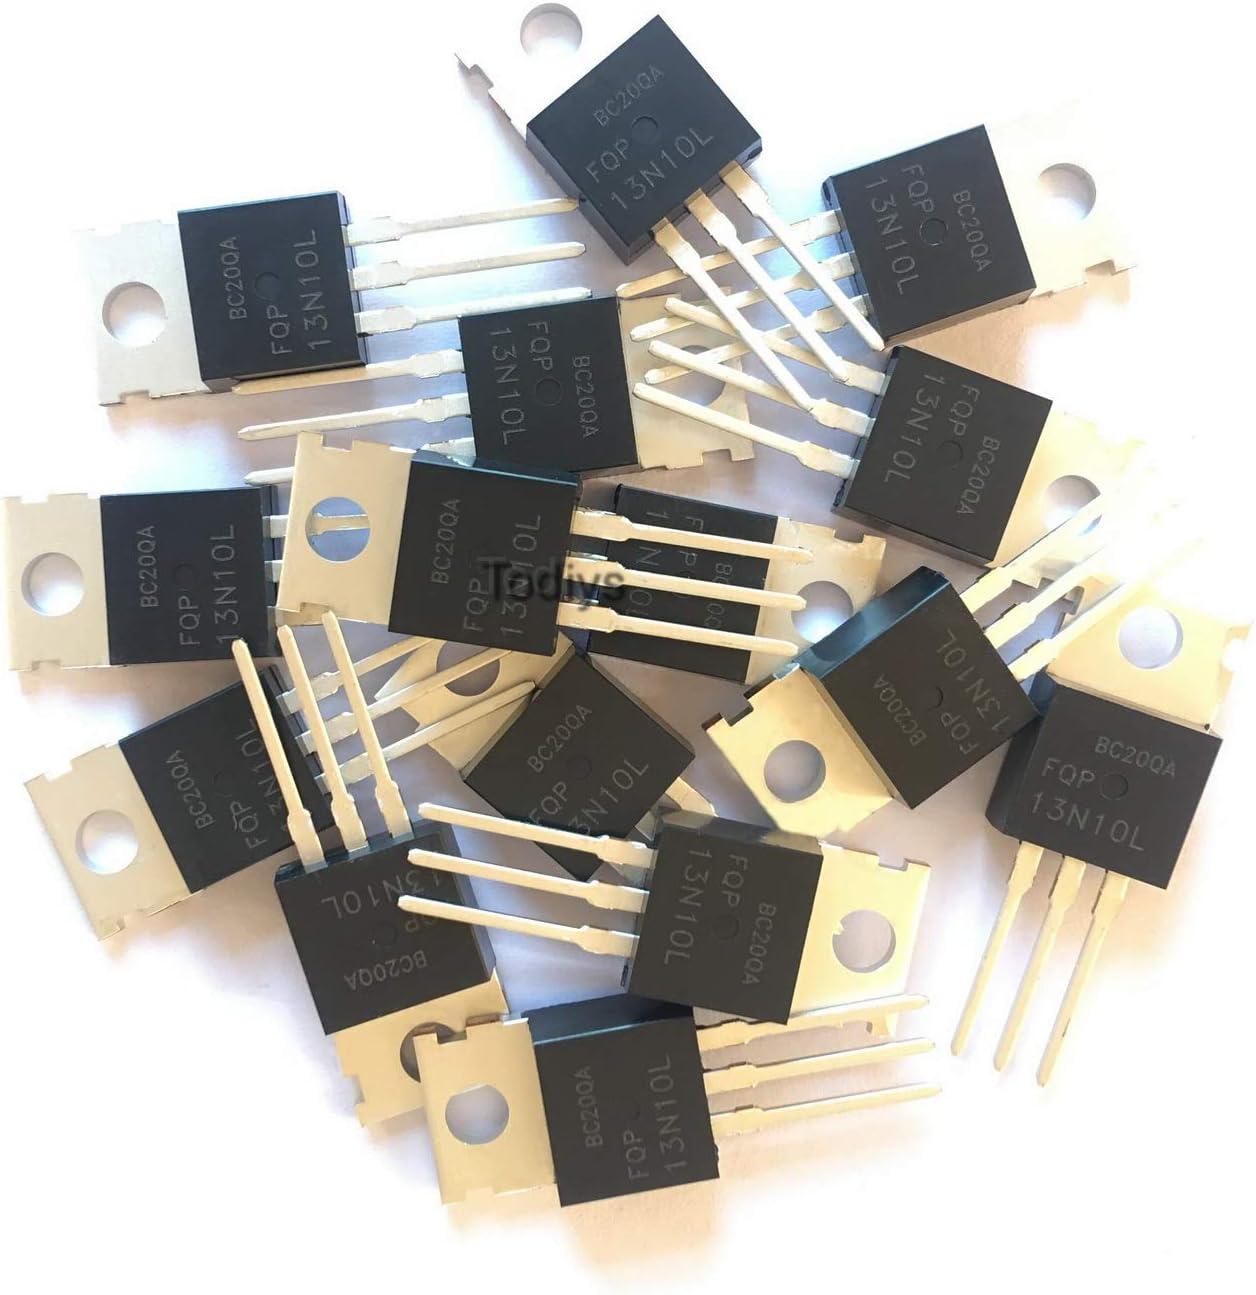 10PCS FQP13N10L 13N10 13N10L N-Channel MOSFET TO-220